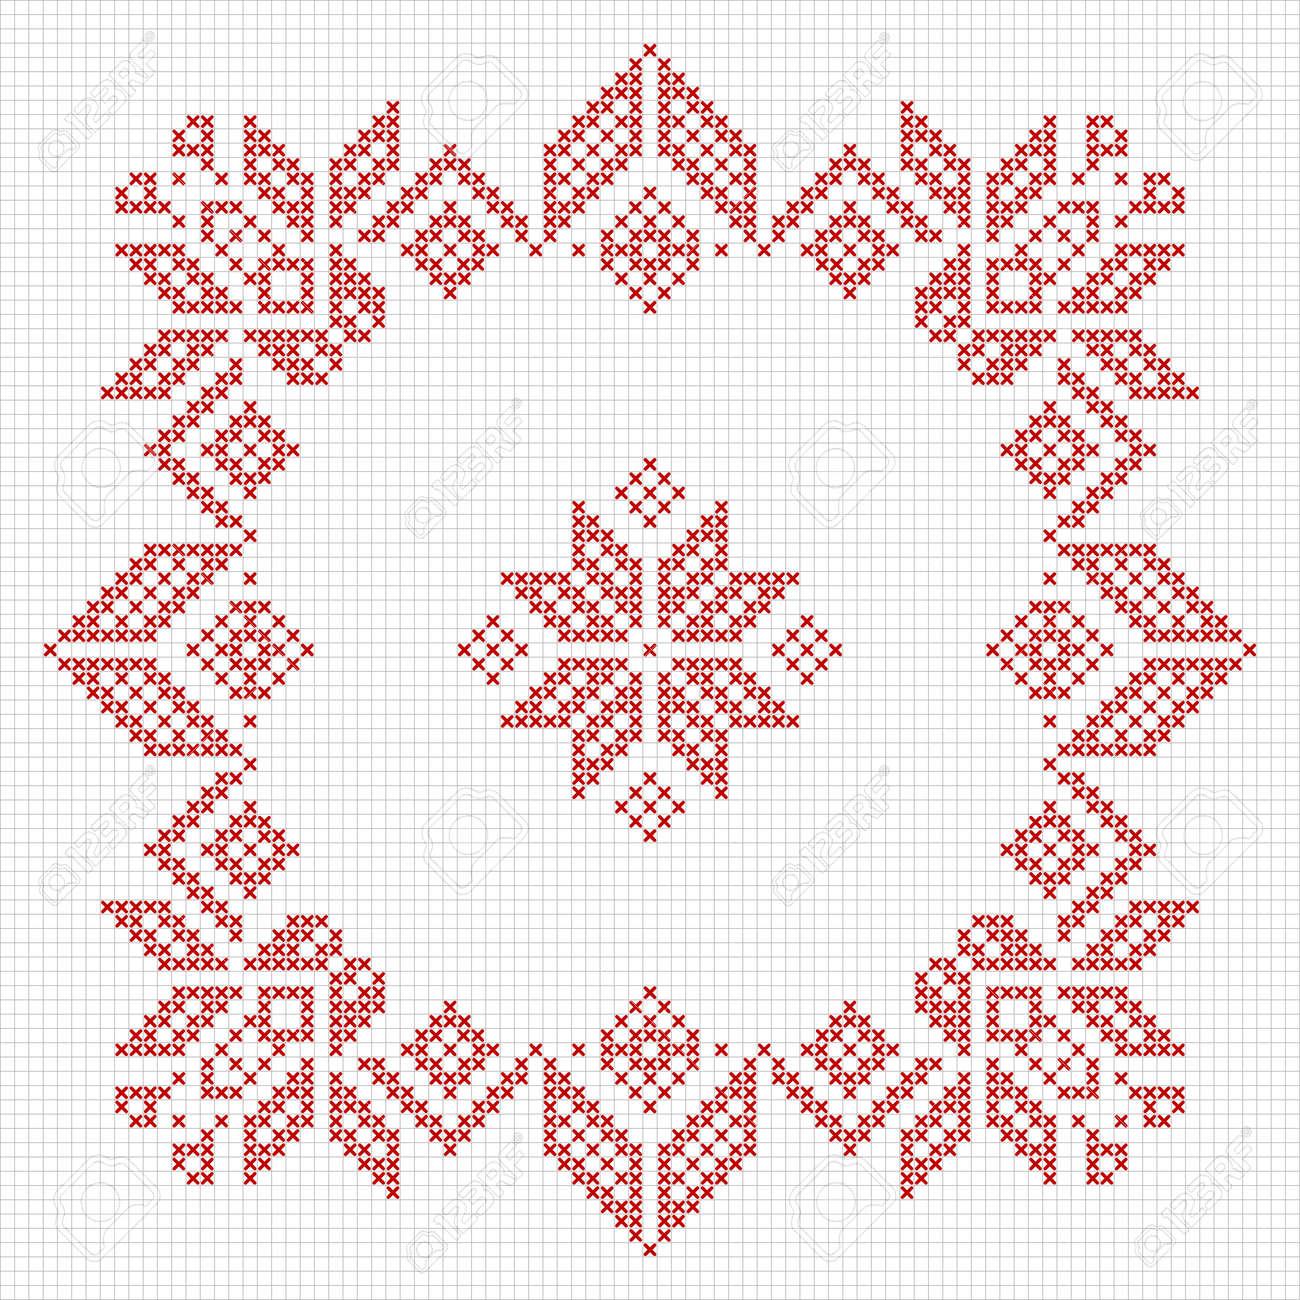 Scandinavian Style Cross Stitch Pattern. Traditional Biscornu ...